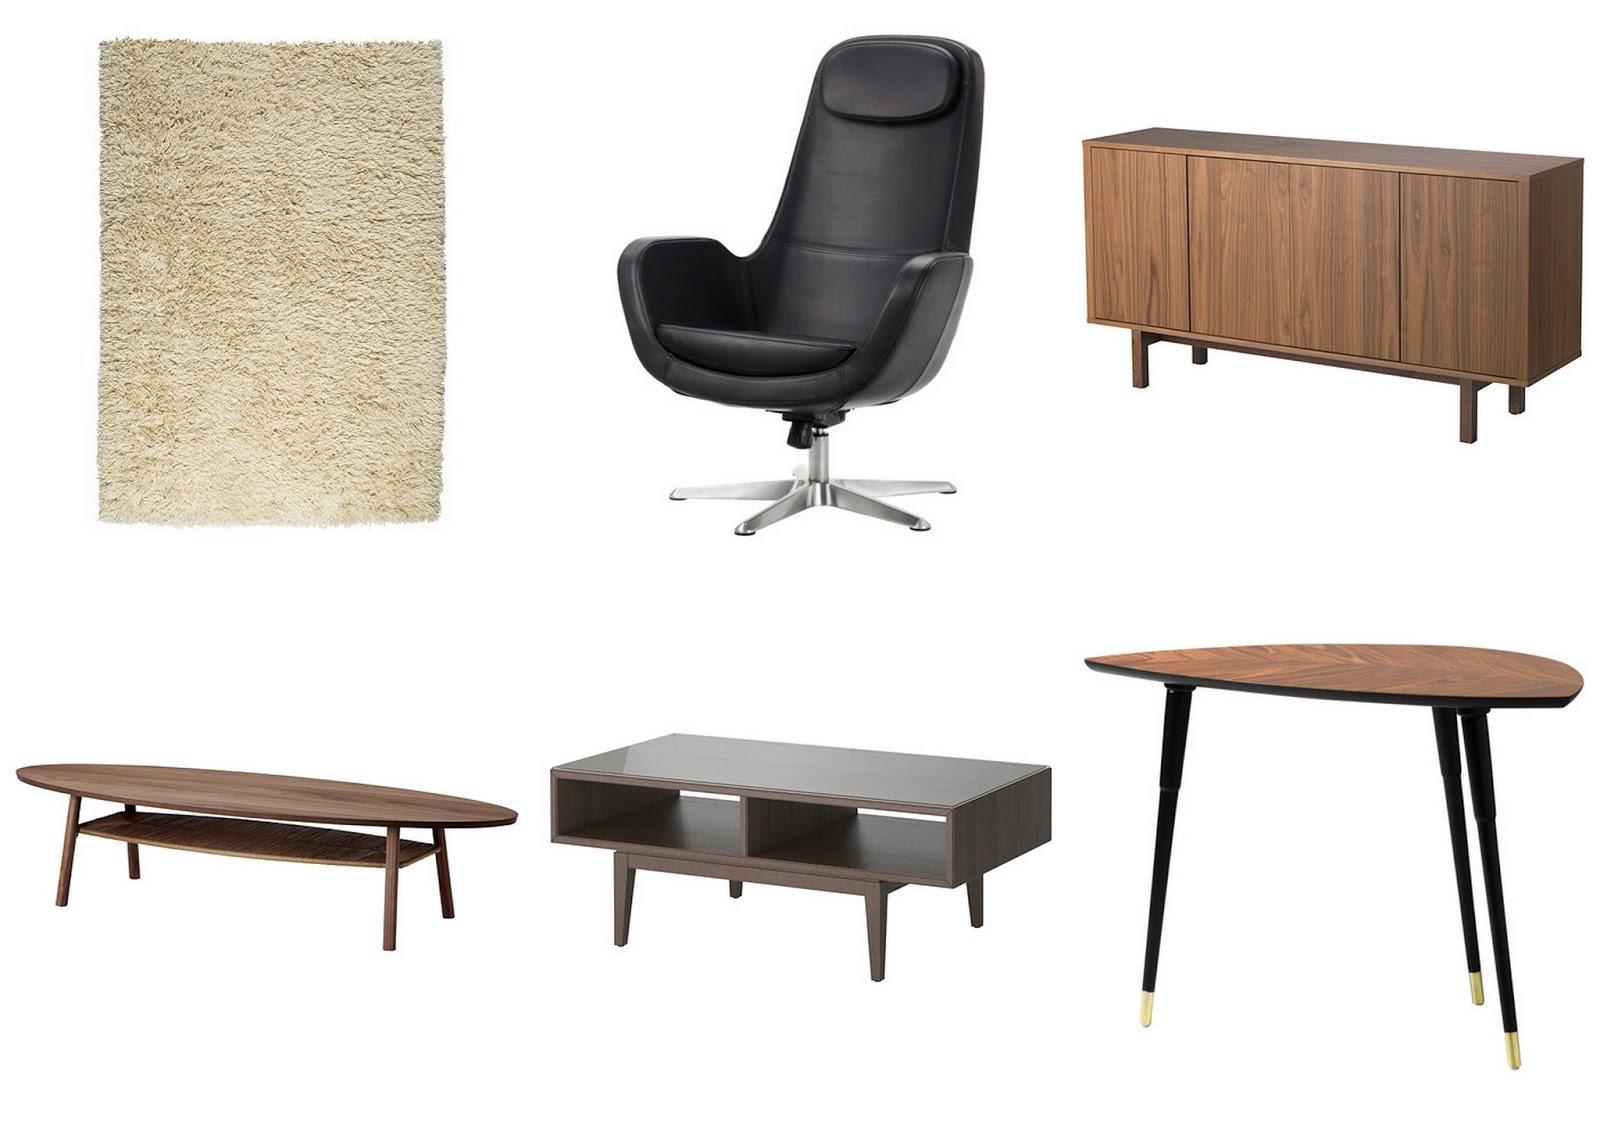 MID CENTURY INSPIRED IKEA FURNITURE - HIP HIP HOME!